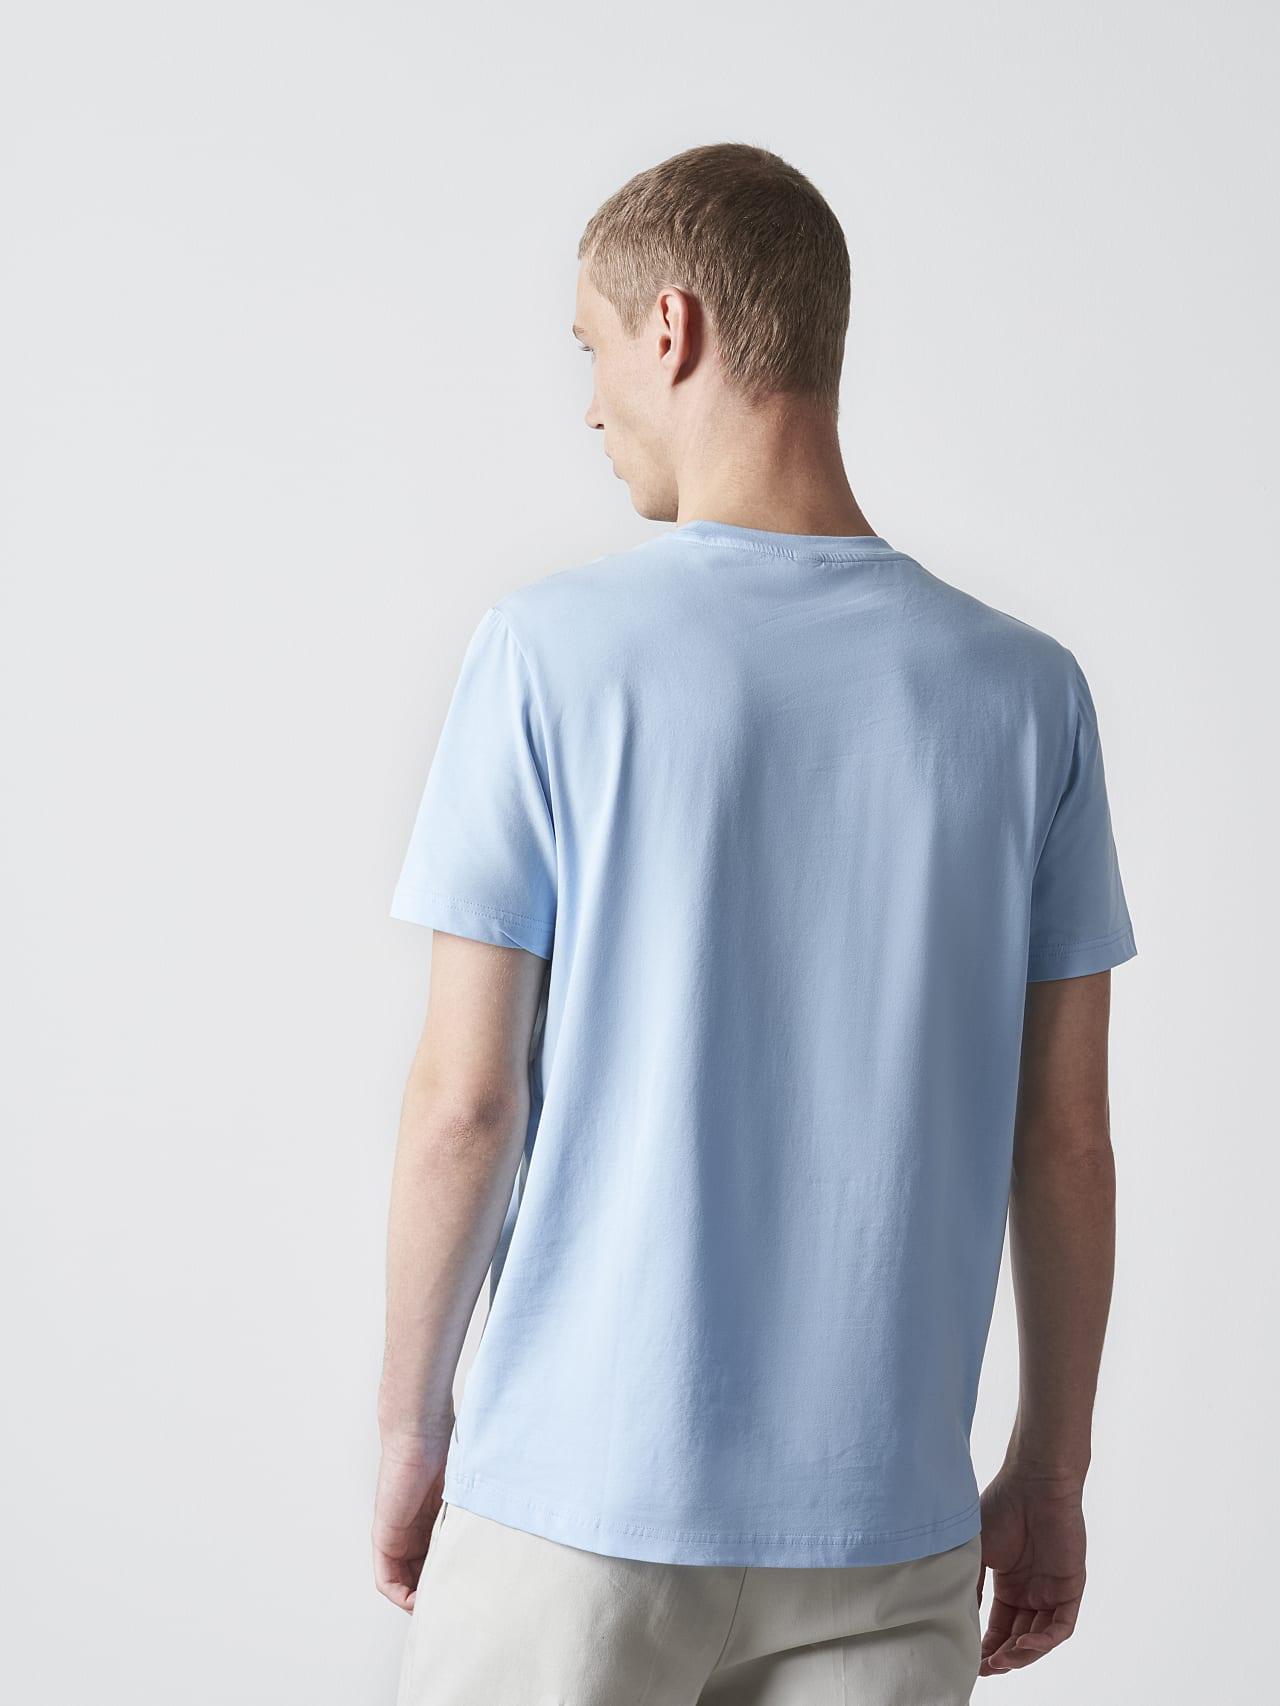 JERO V2.Y4.02 Signature Logo T-Shirt light blue Front Main Alpha Tauri